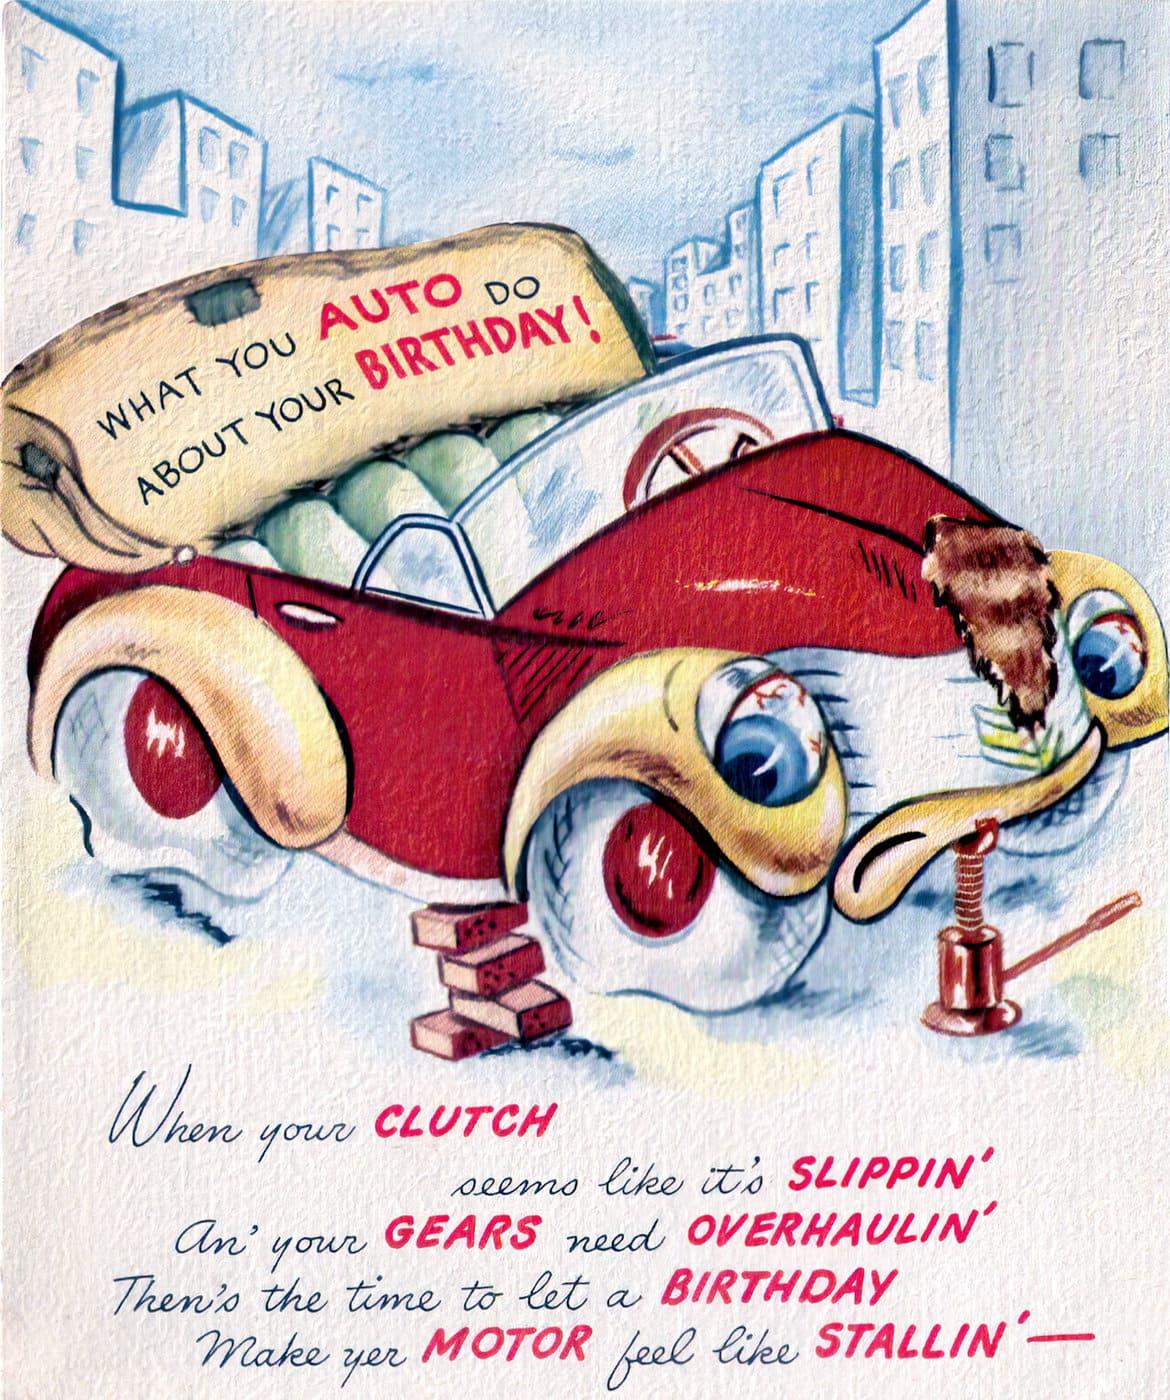 Vintage 1940s birthday card - Red car